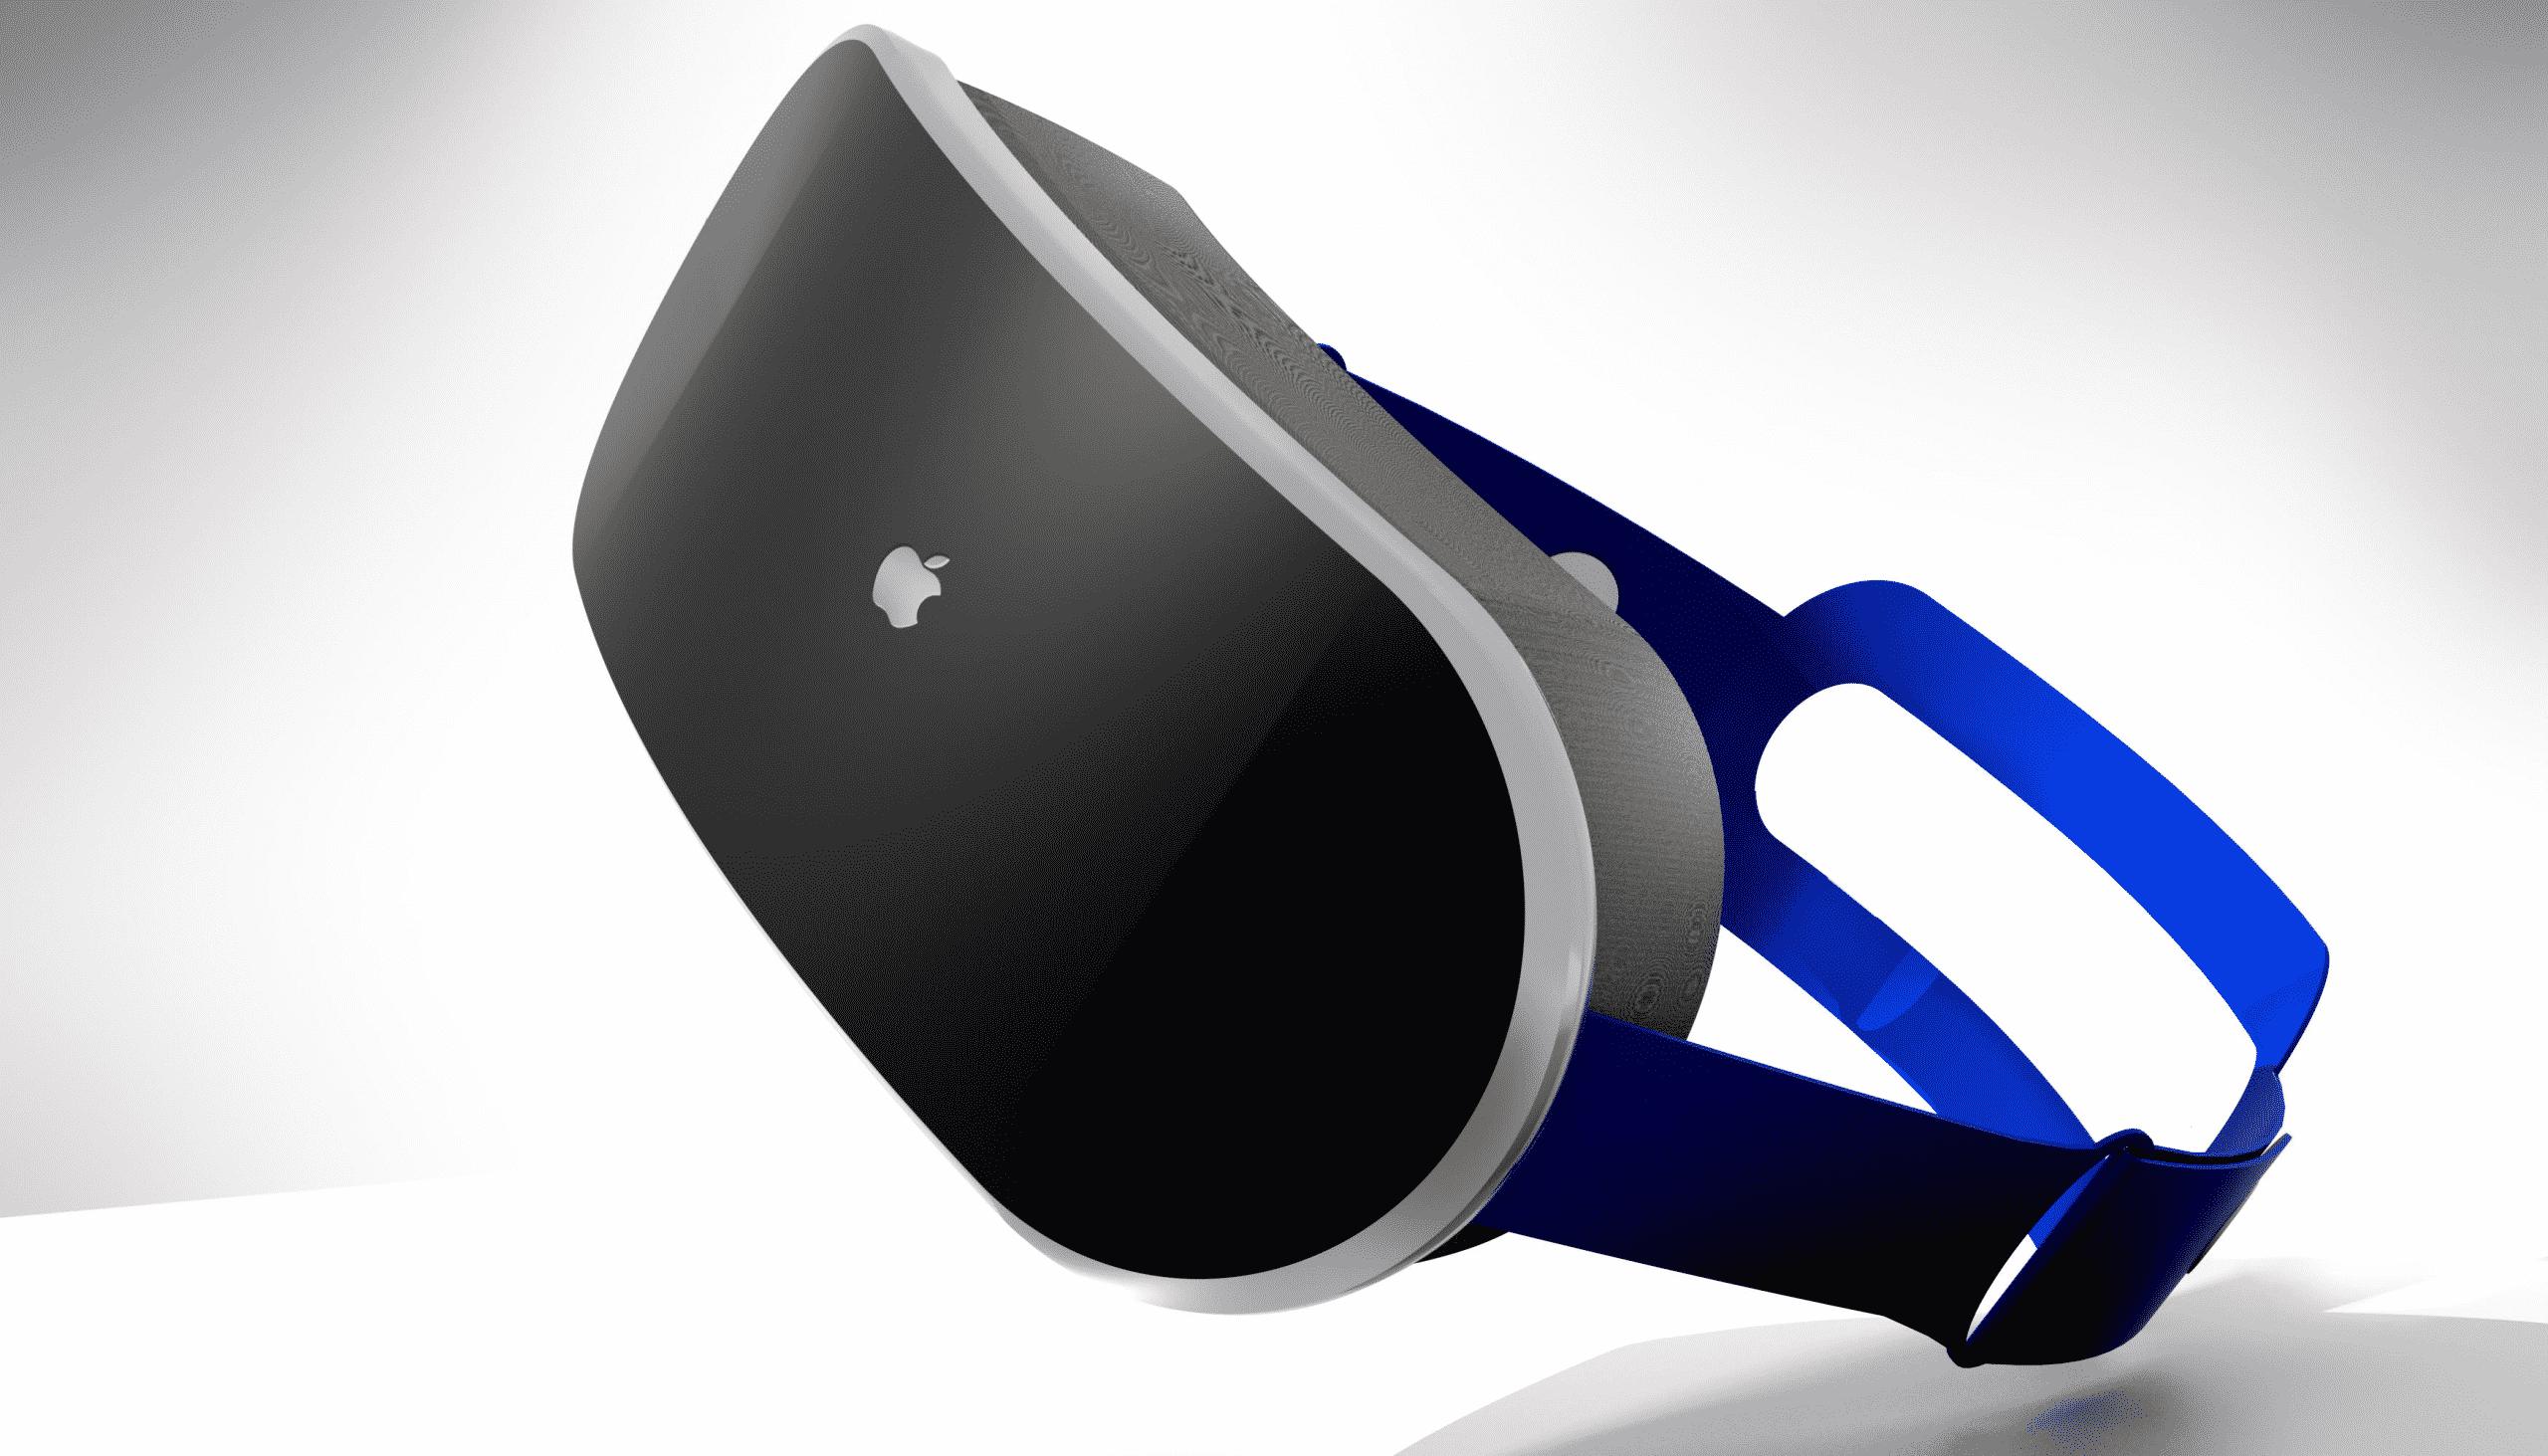 Apple patent reveals details about AR/VR headset